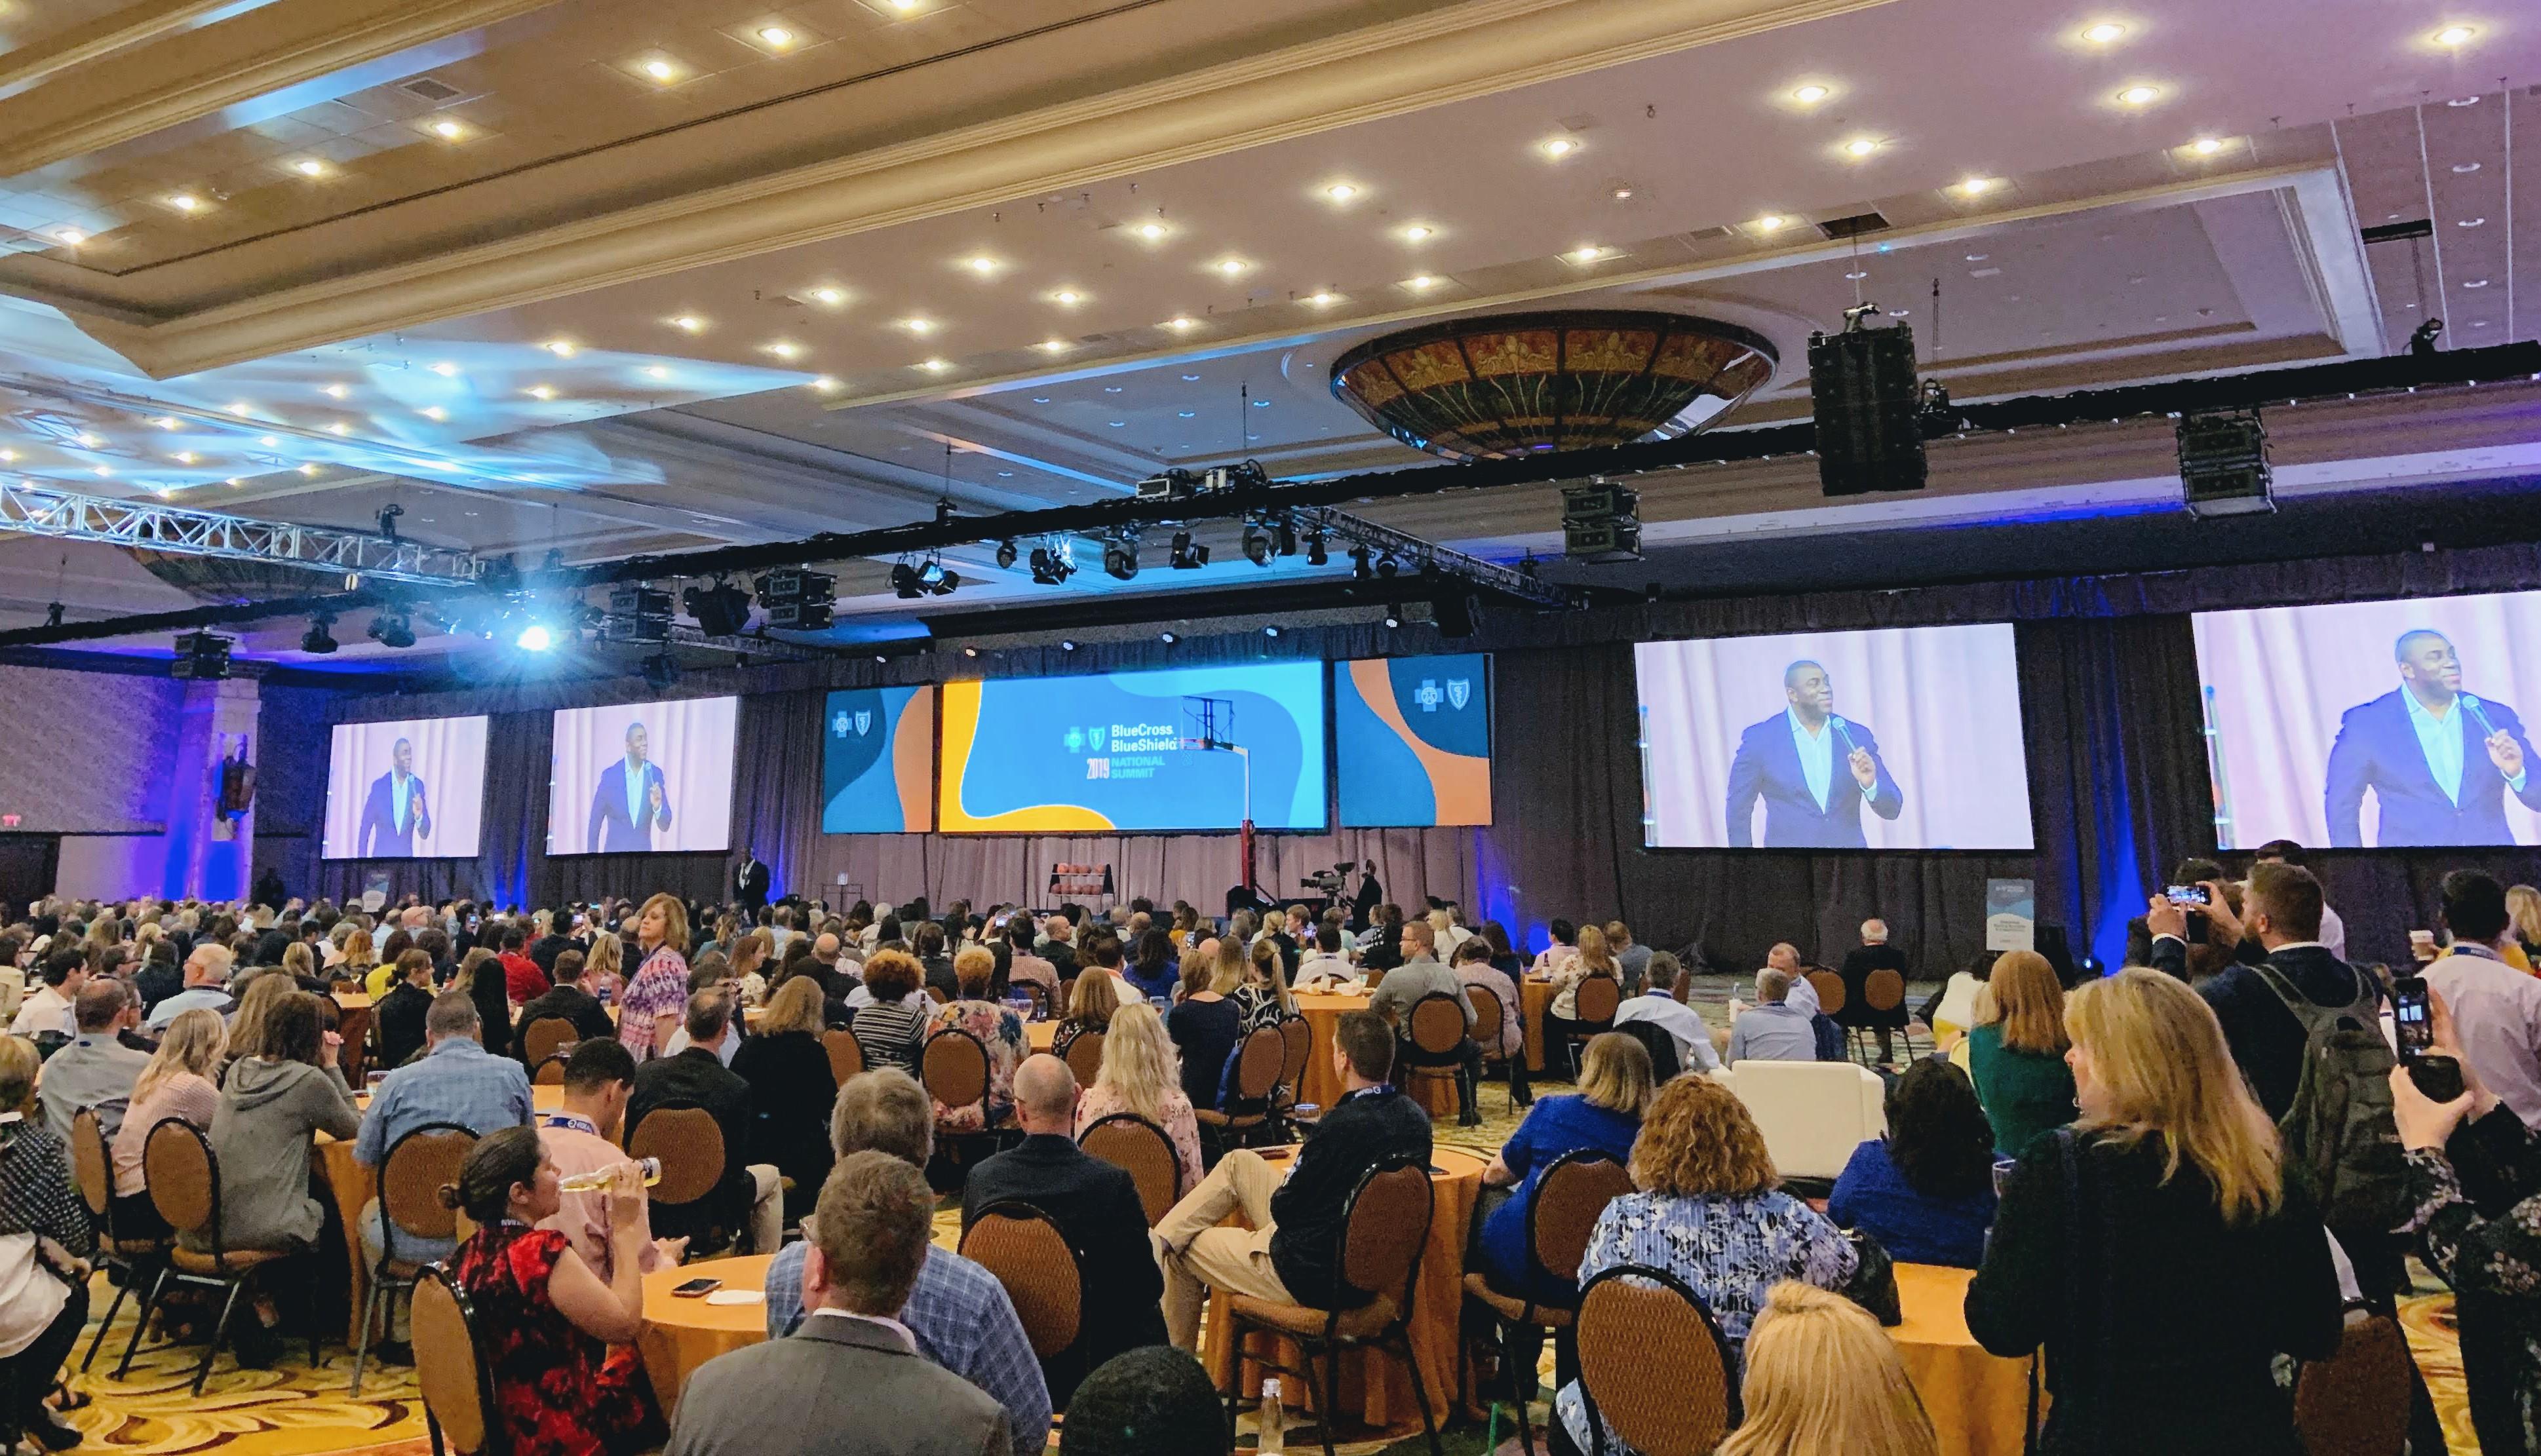 Magic Johnson speaks at the Blue Cross Blue Shield National Summit 2019 in Dallas, Texas.